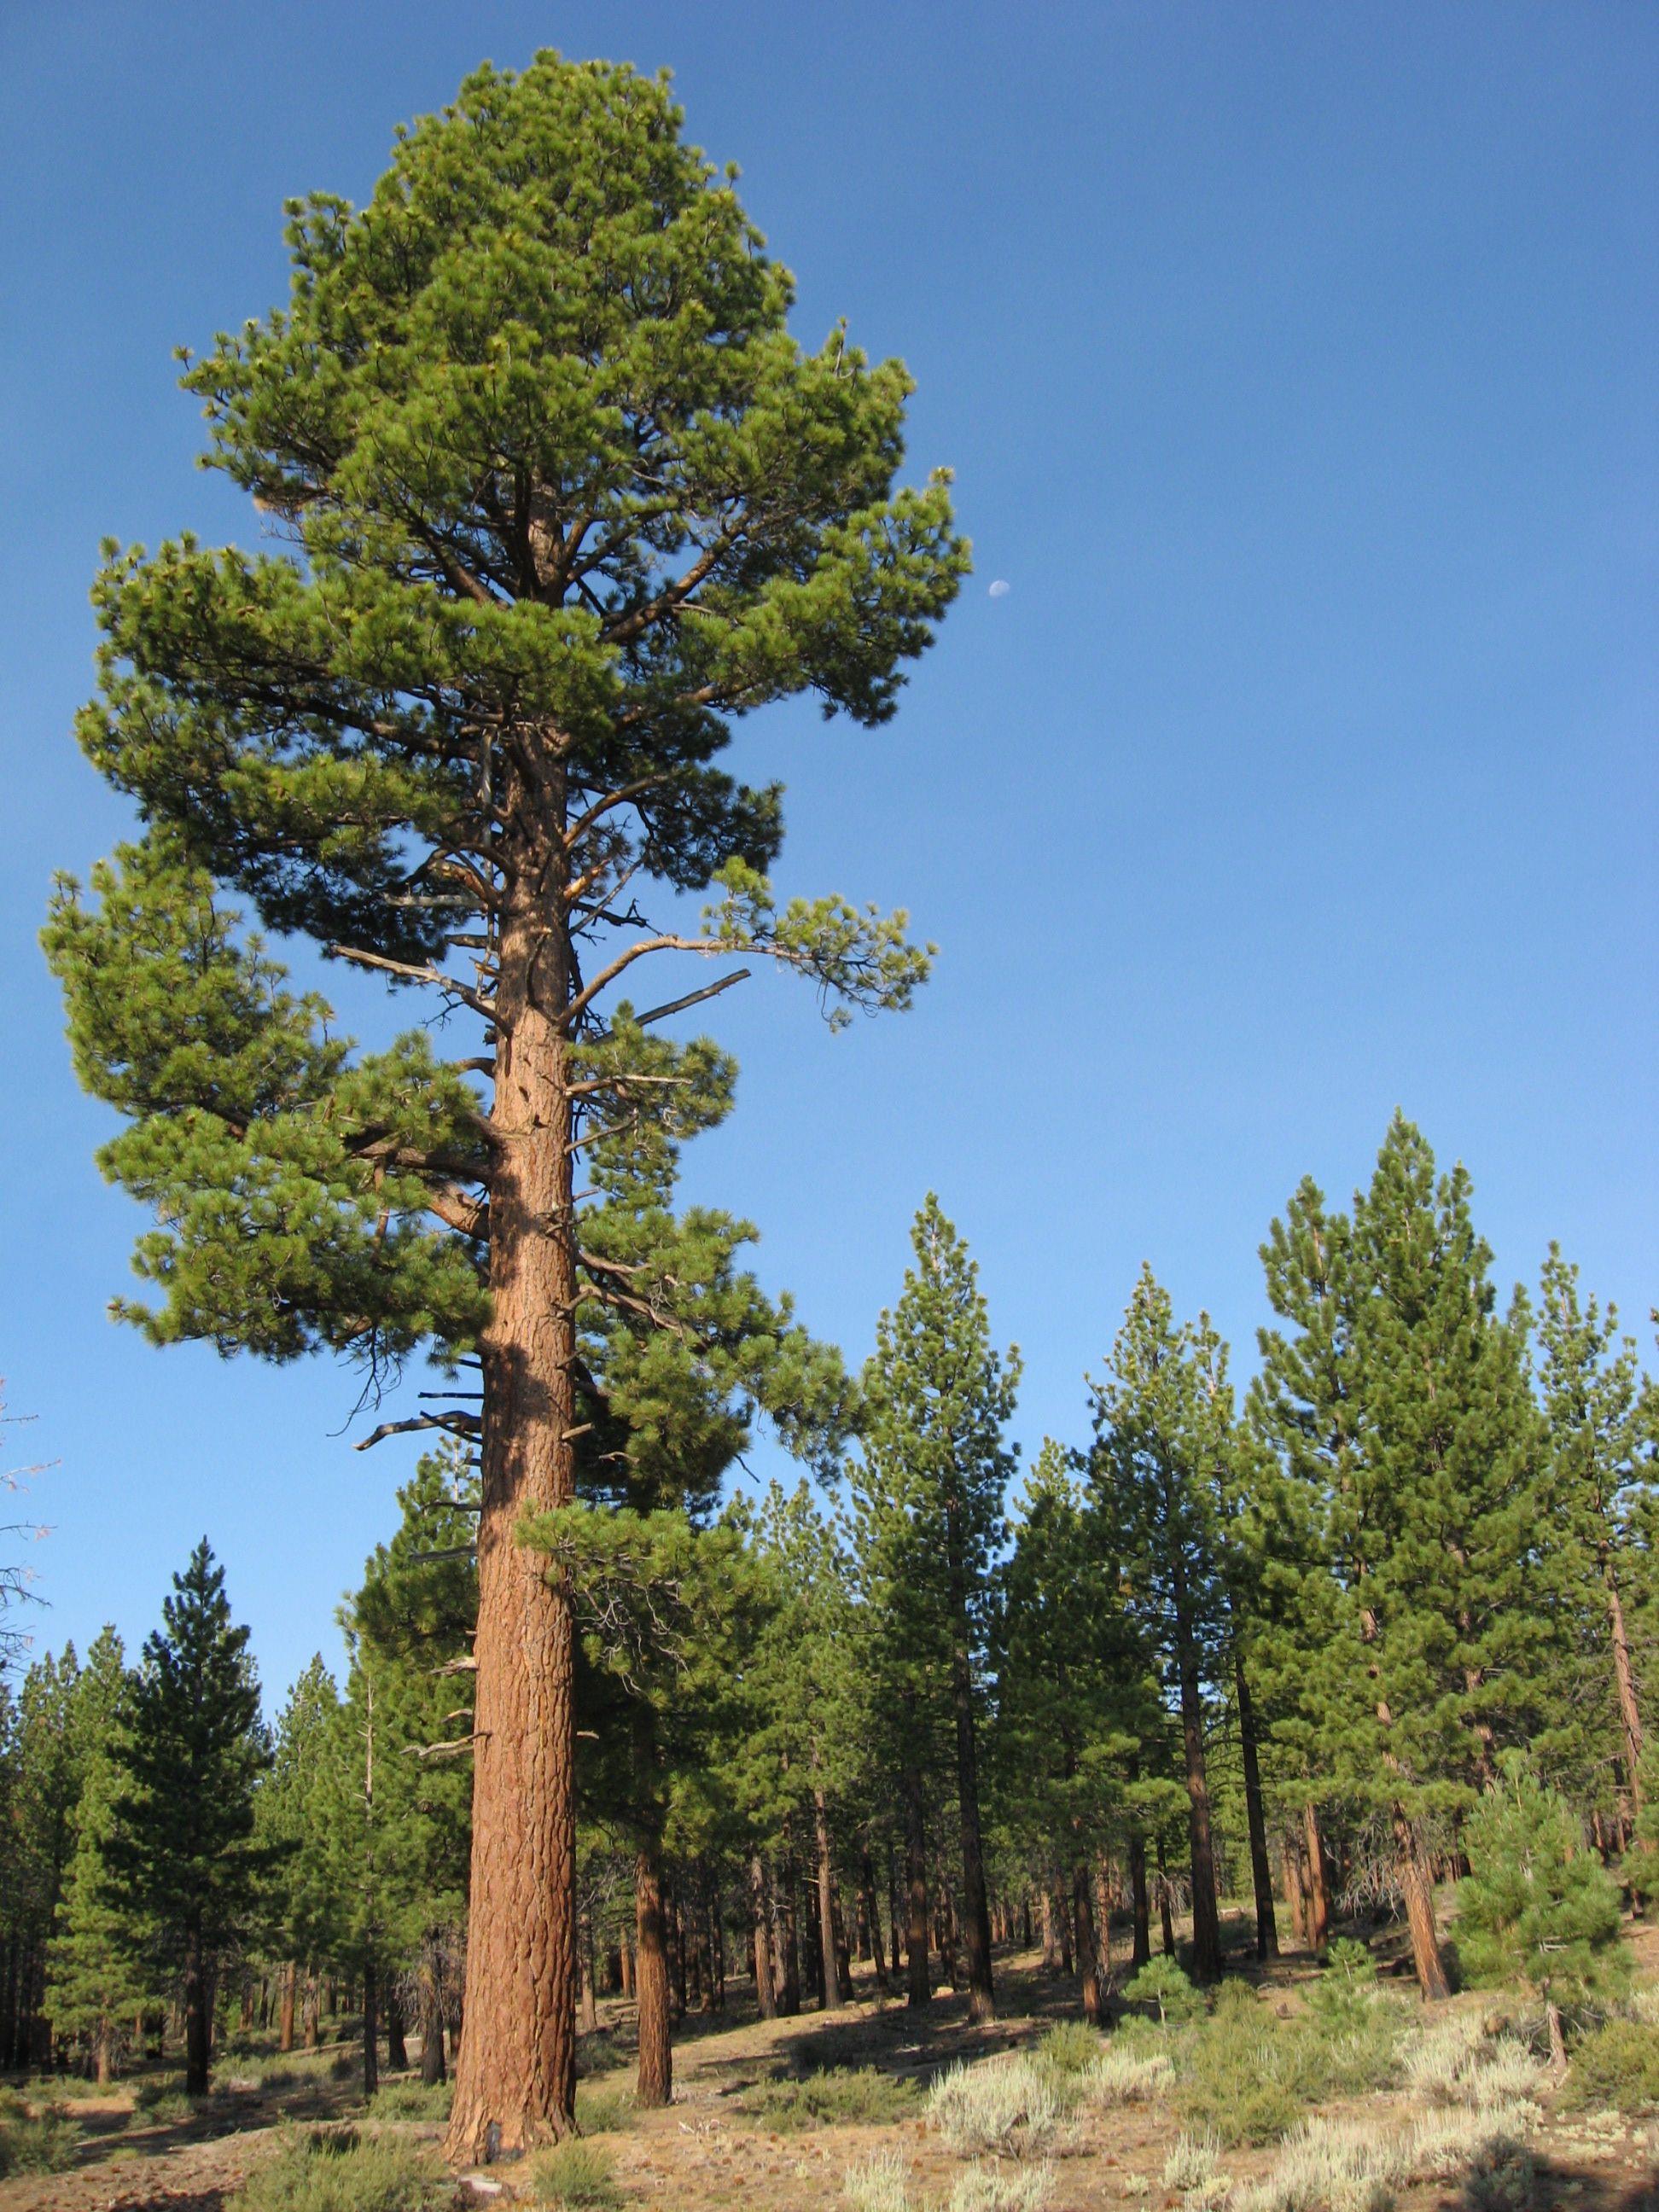 Pine Tree In Barcelona Transperfect: Jeffrey Pine Or Black Pine (Pinus Jeffreyi) Is A North